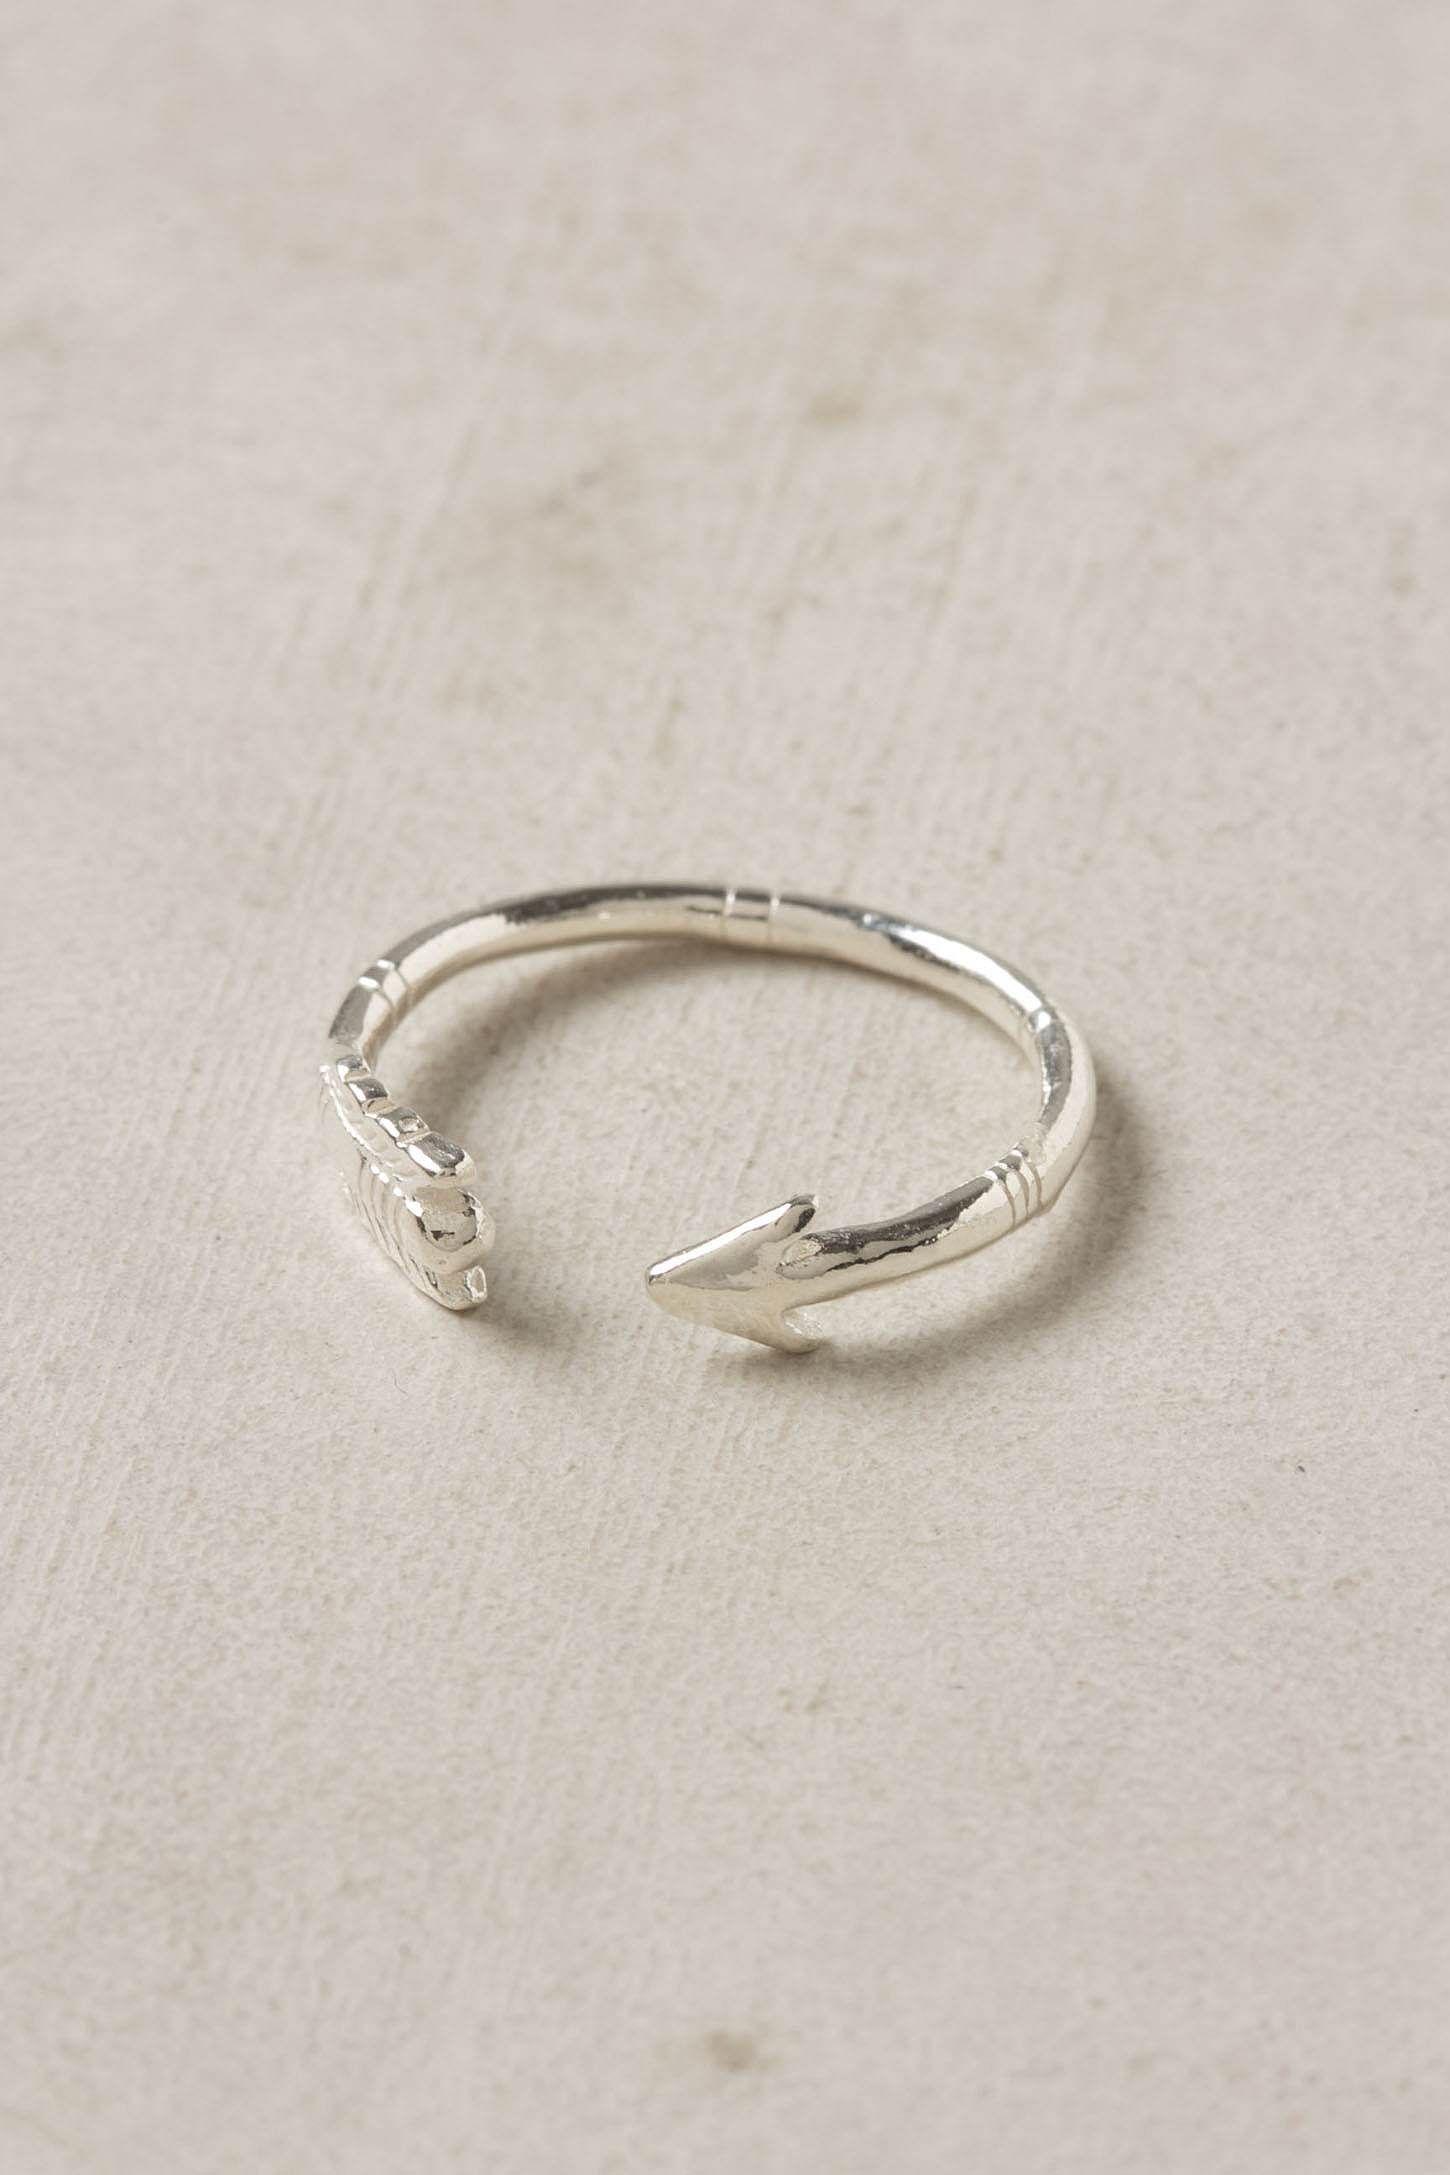 I love dainty rings.